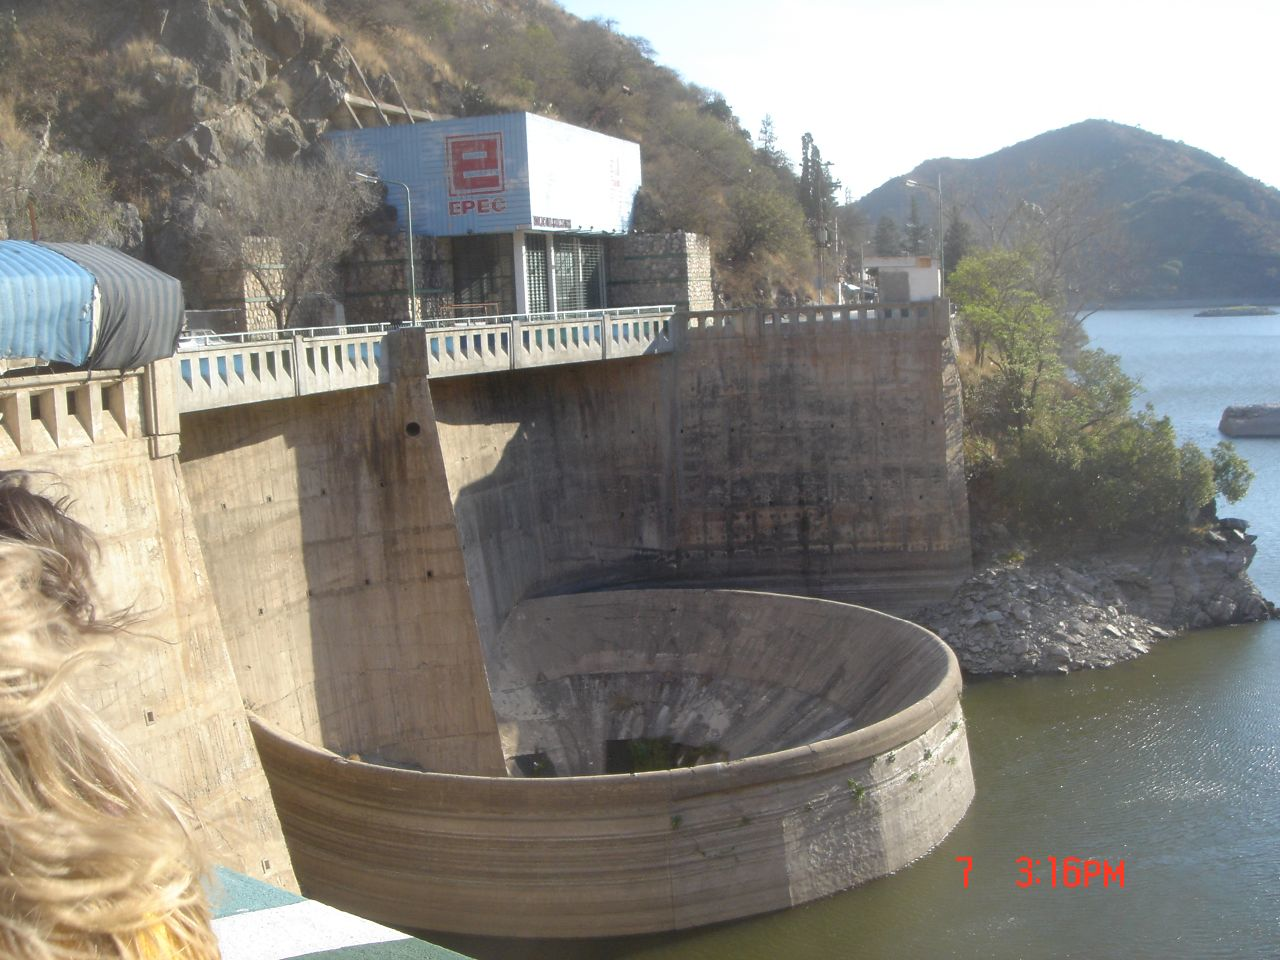 Dam near Carlos Paz, Argentina